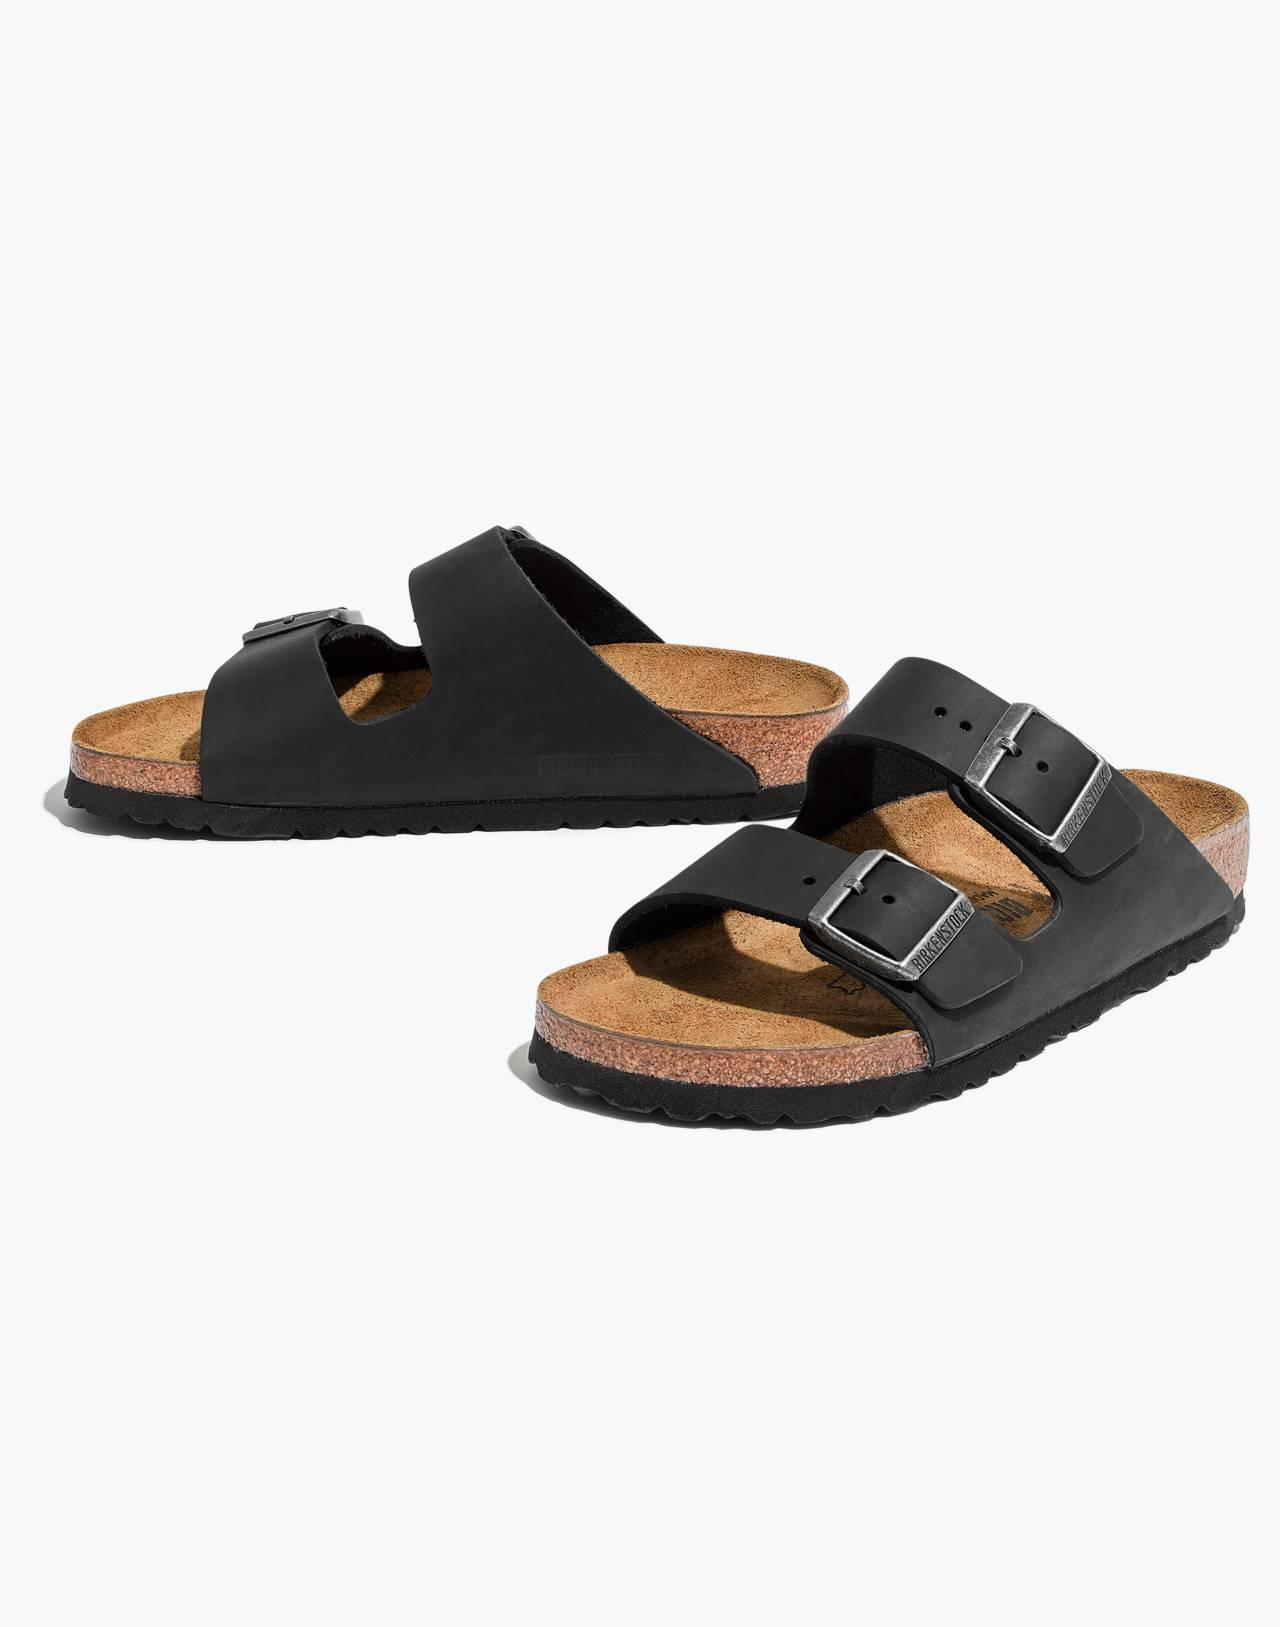 Birkenstock® Arizona Sandals in Black Leather in true black image 1